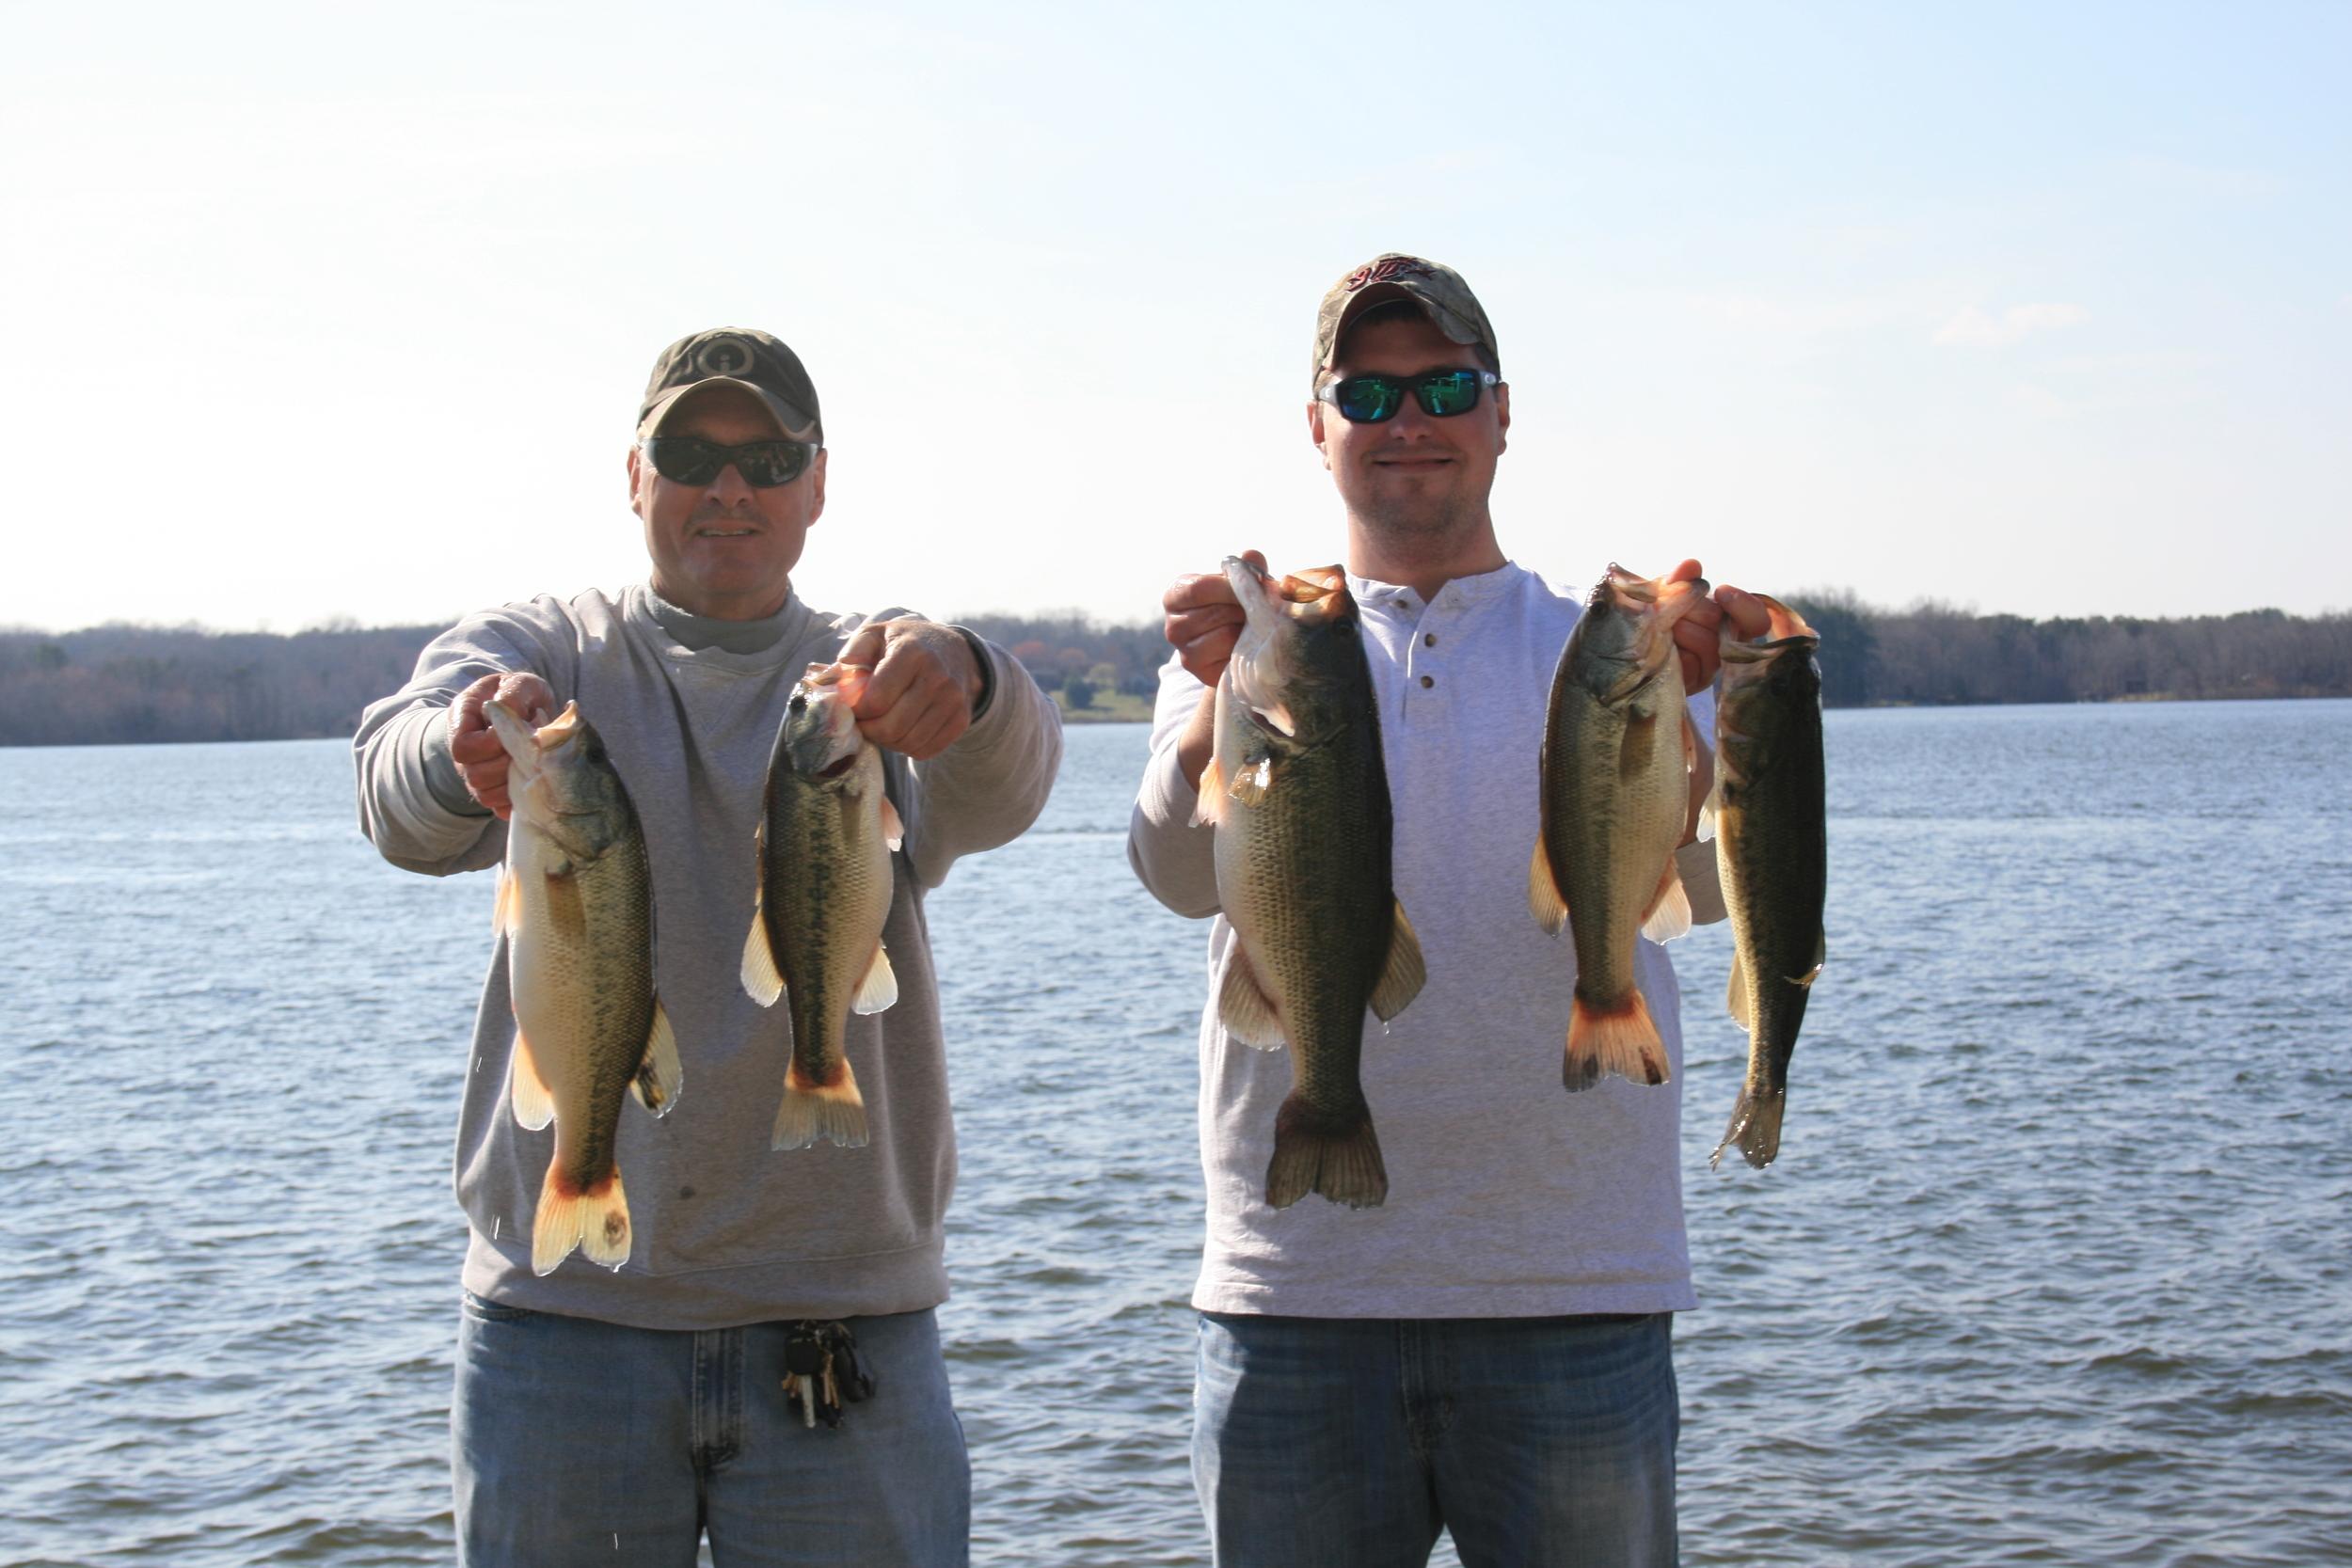 John Sherer and Corey Blake Second Place 15.15 lbs